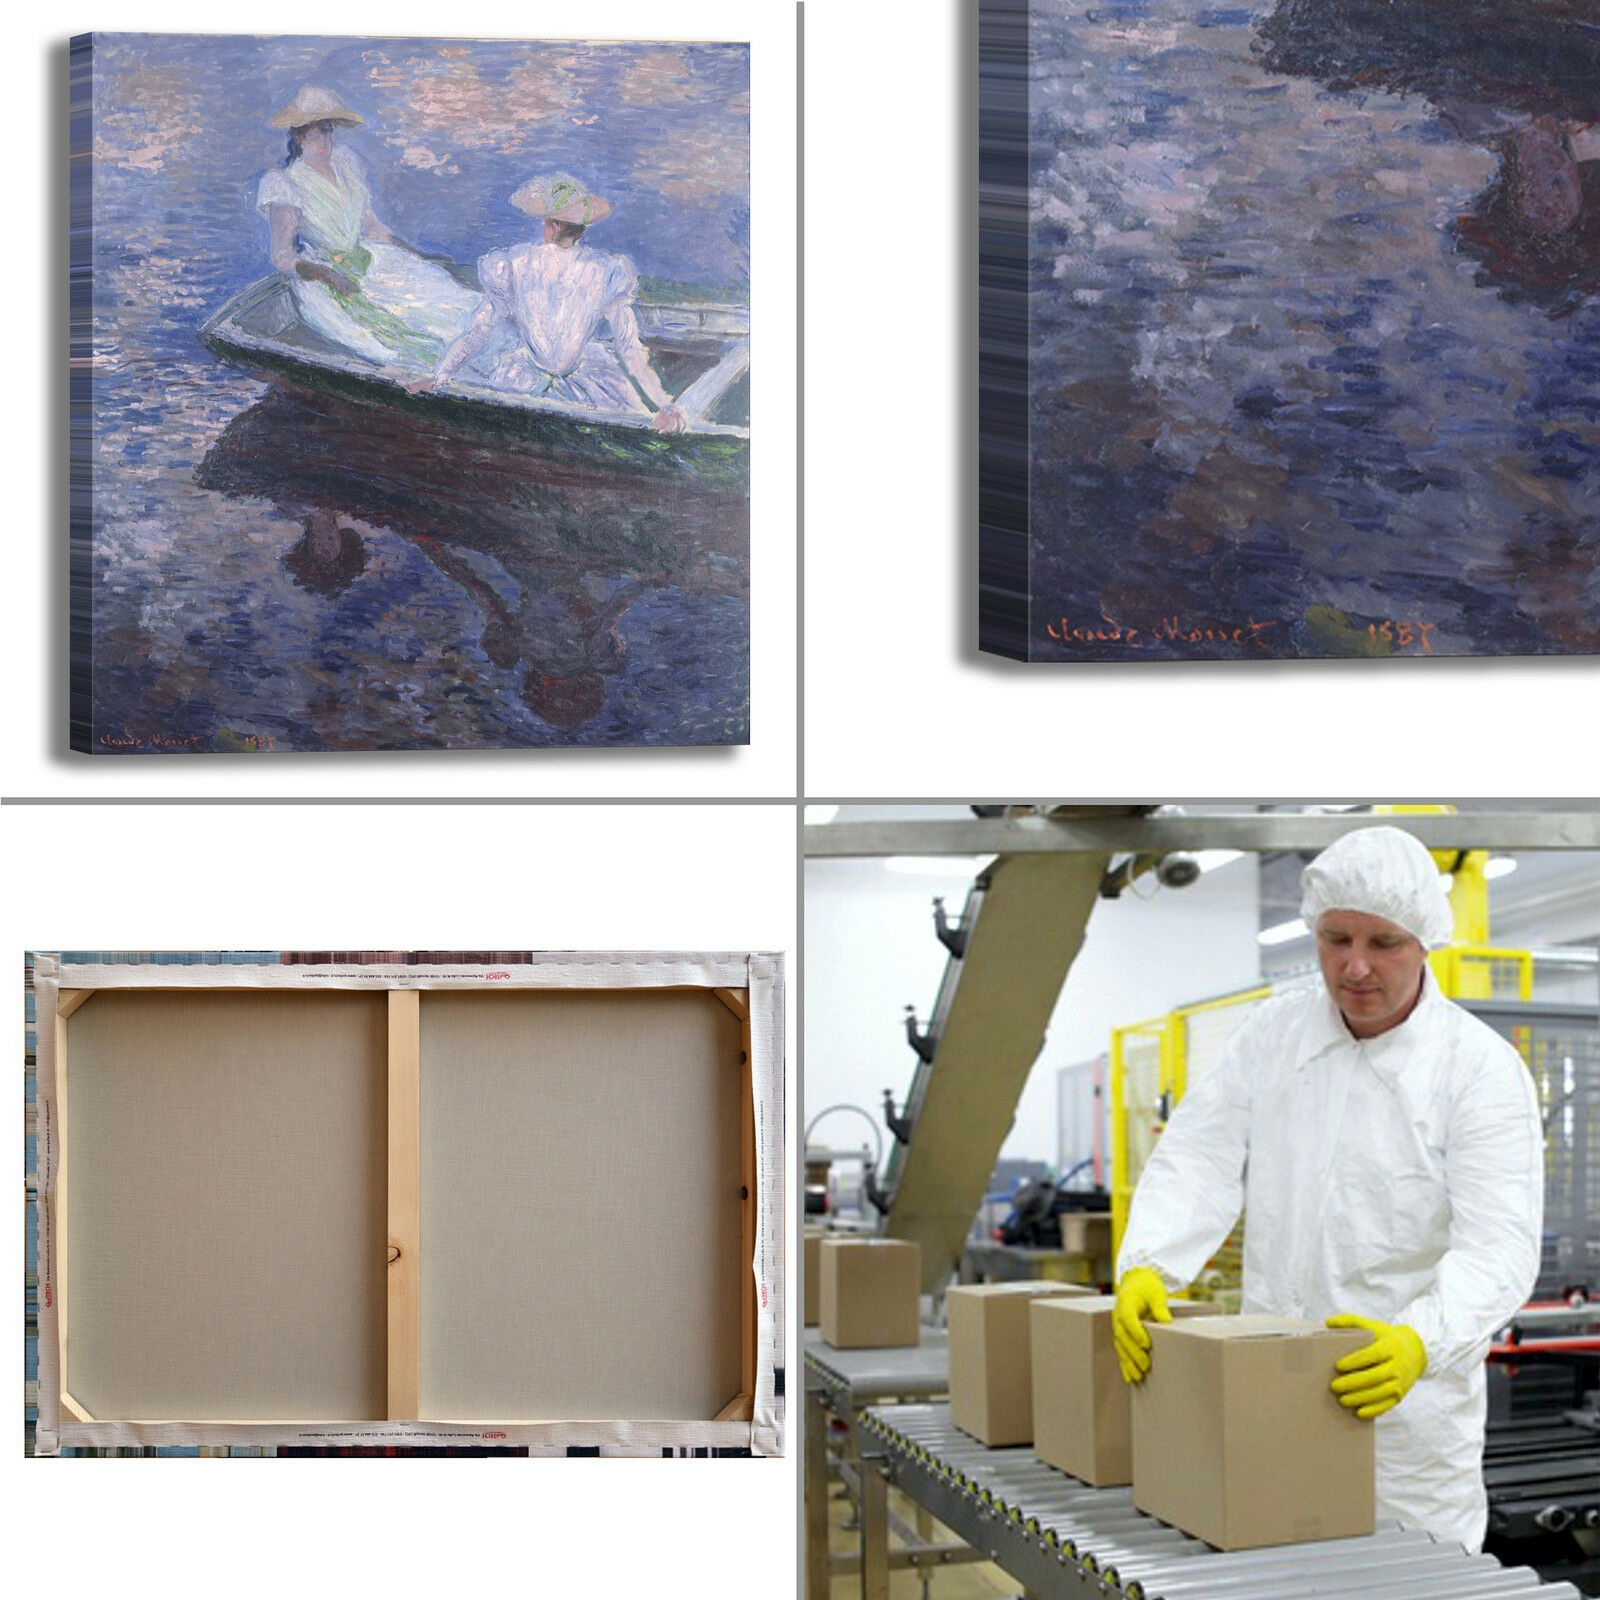 Monet sulla quadro barca design quadro sulla stampa tela dipinto telaio arRouge o casa bbac6b